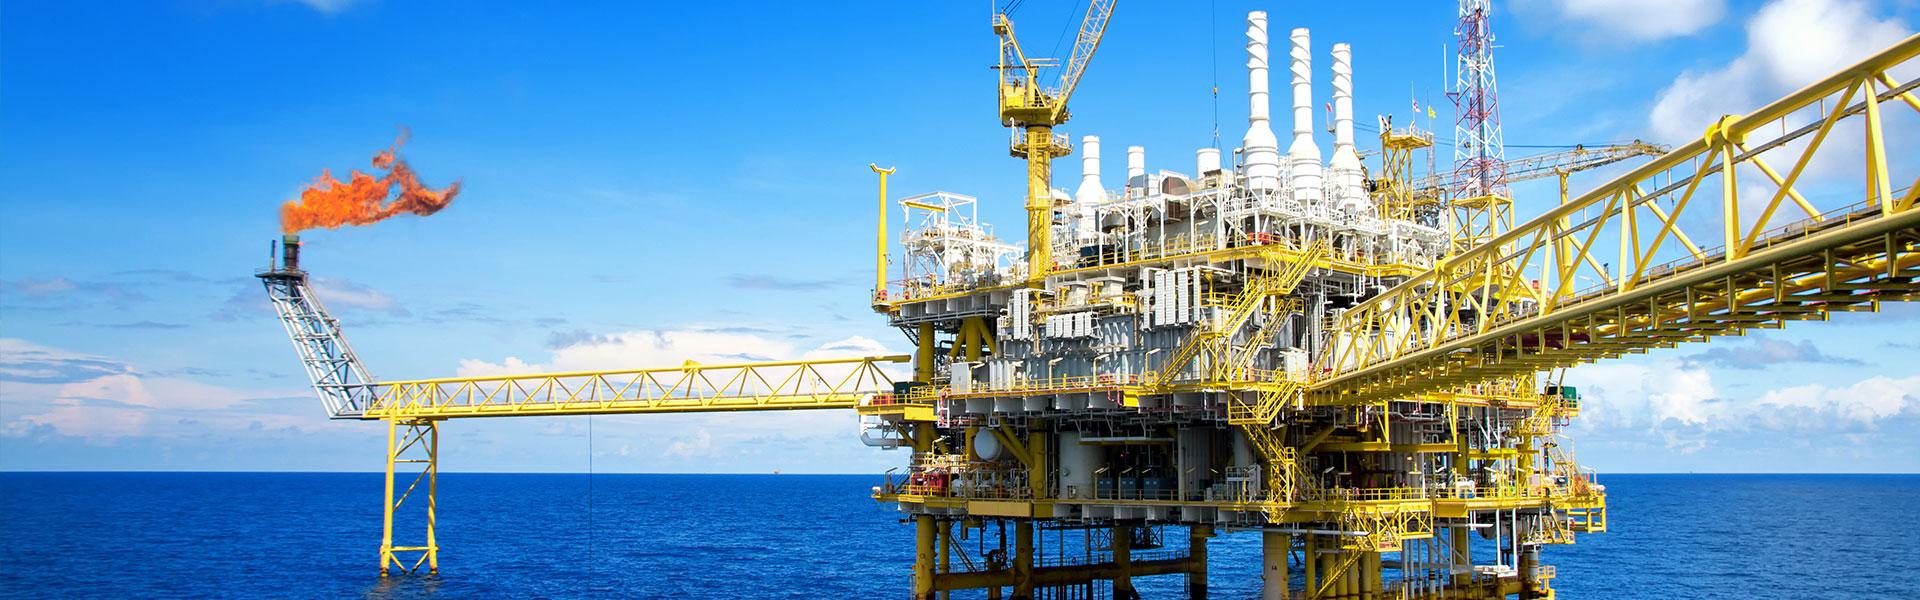 Accruent - Industries - Oil & Gas - Hero